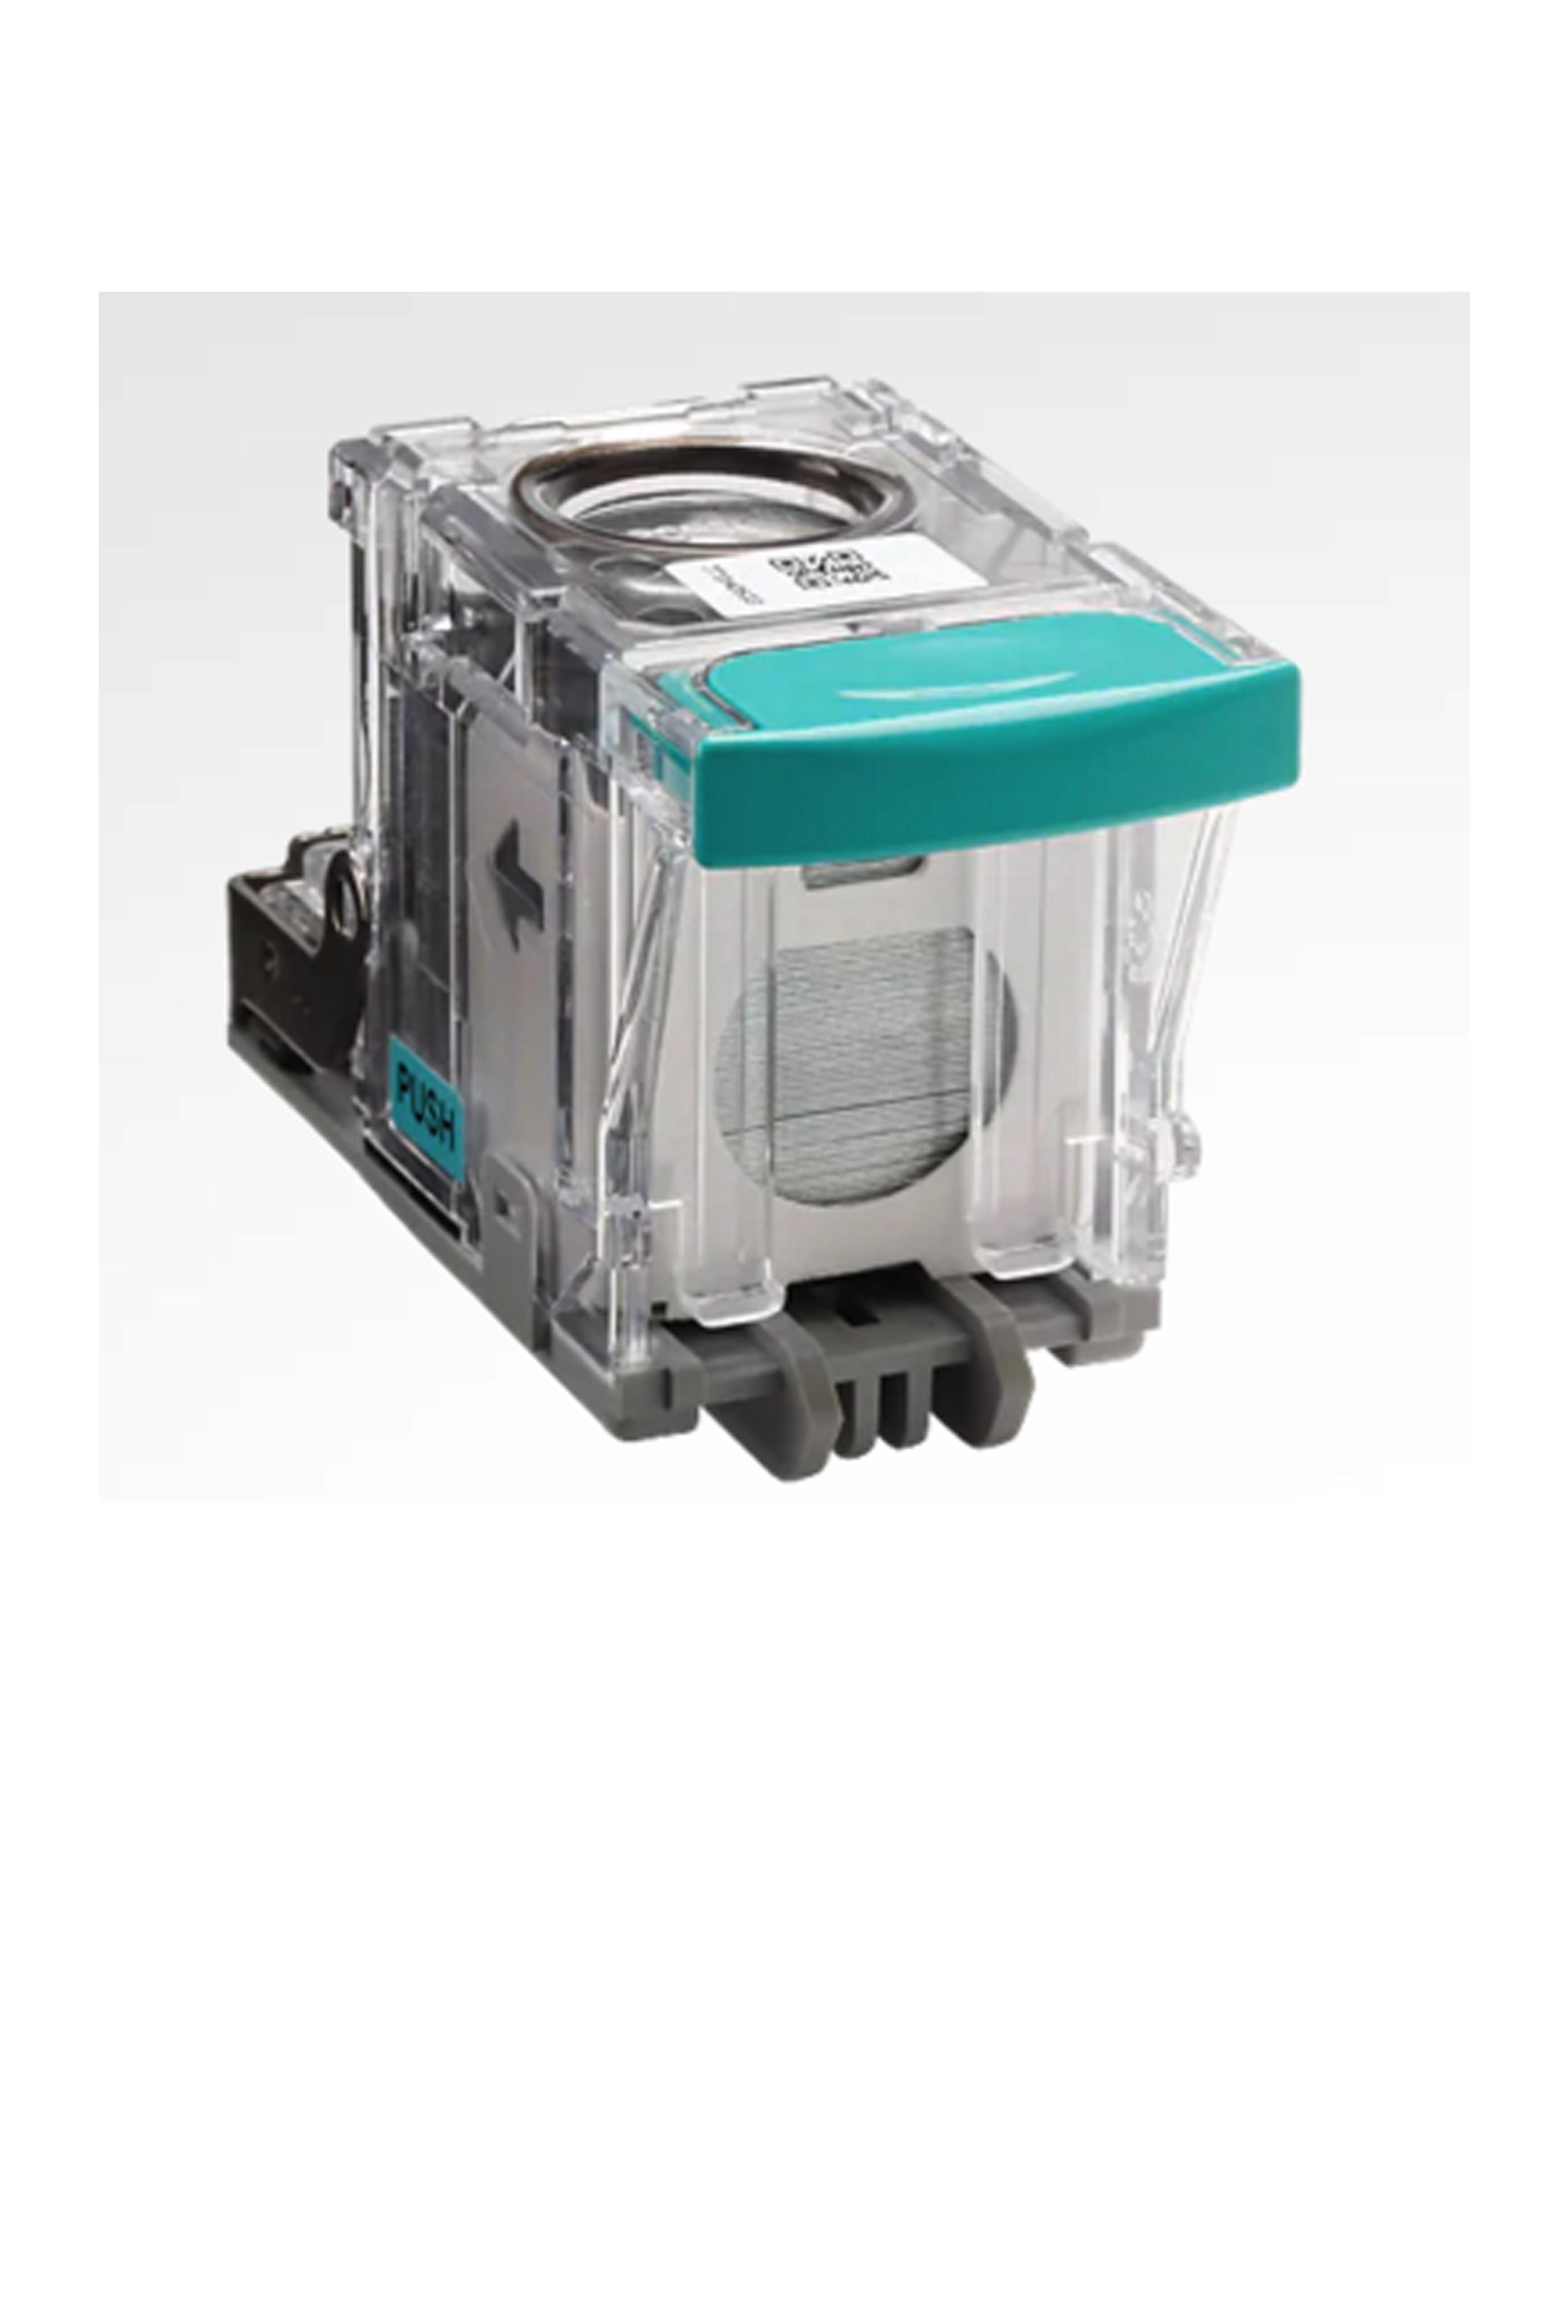 HP Staple Cartridge Refill (C8091A)